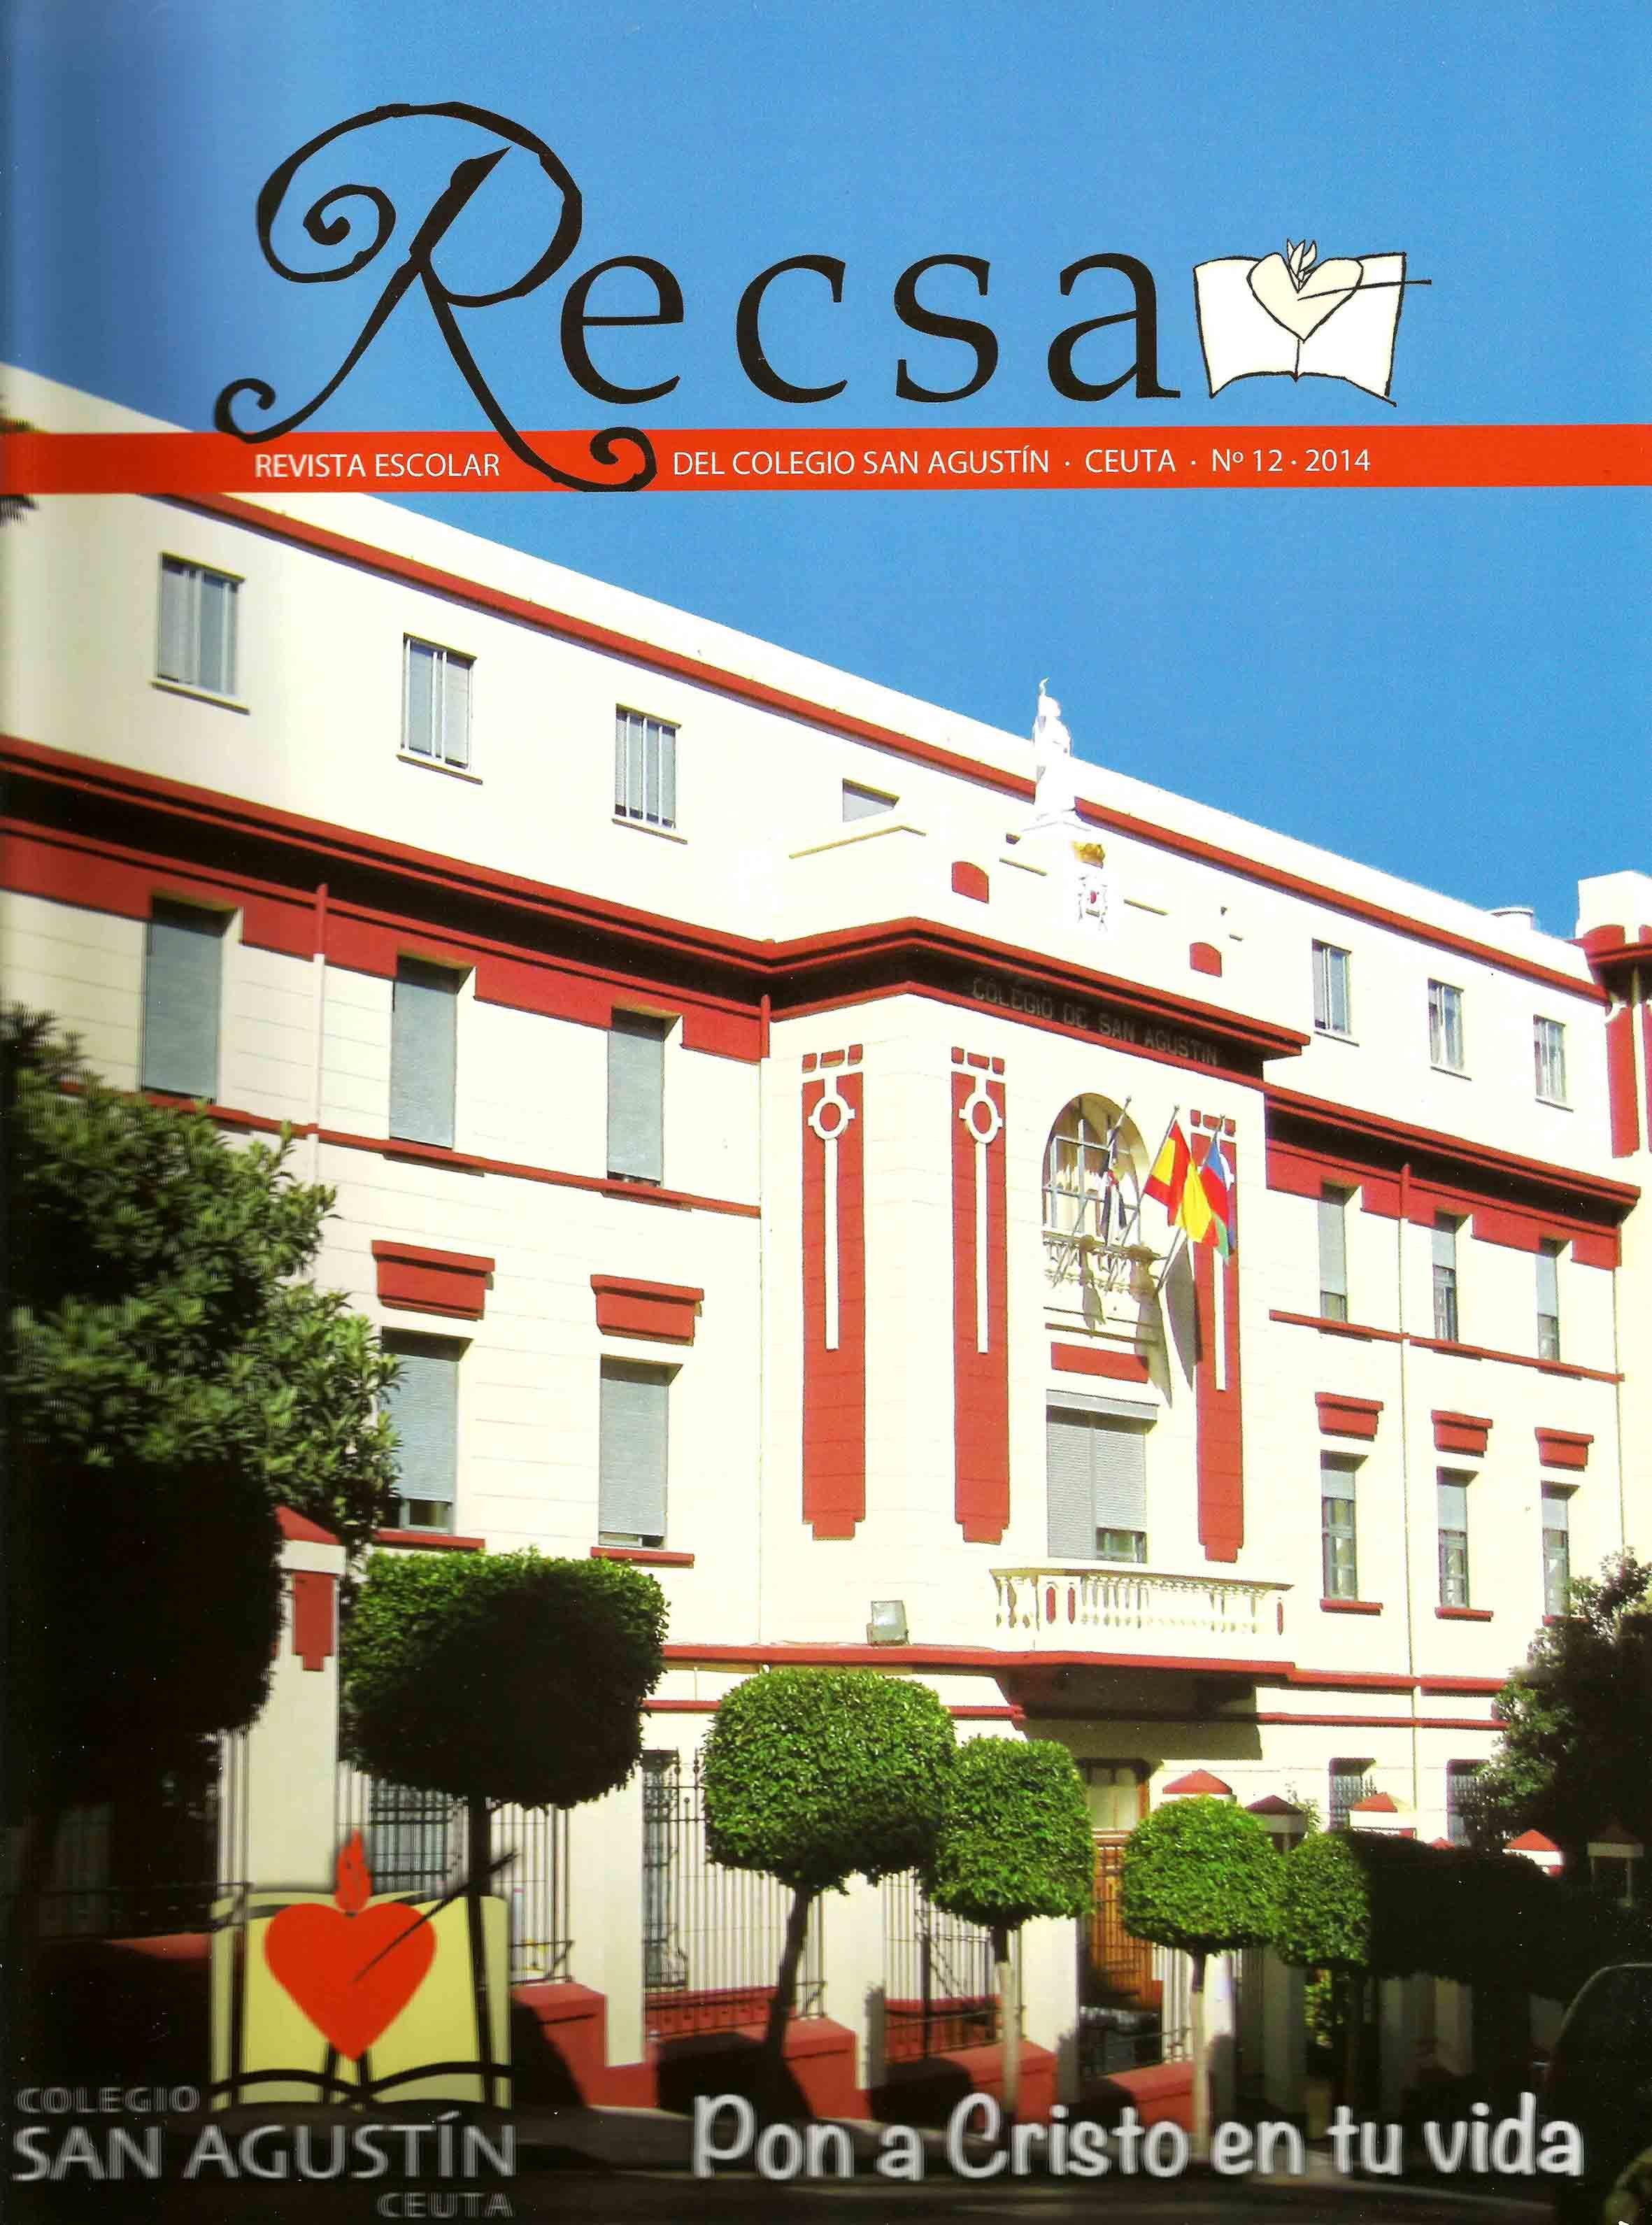 RECSA 2014